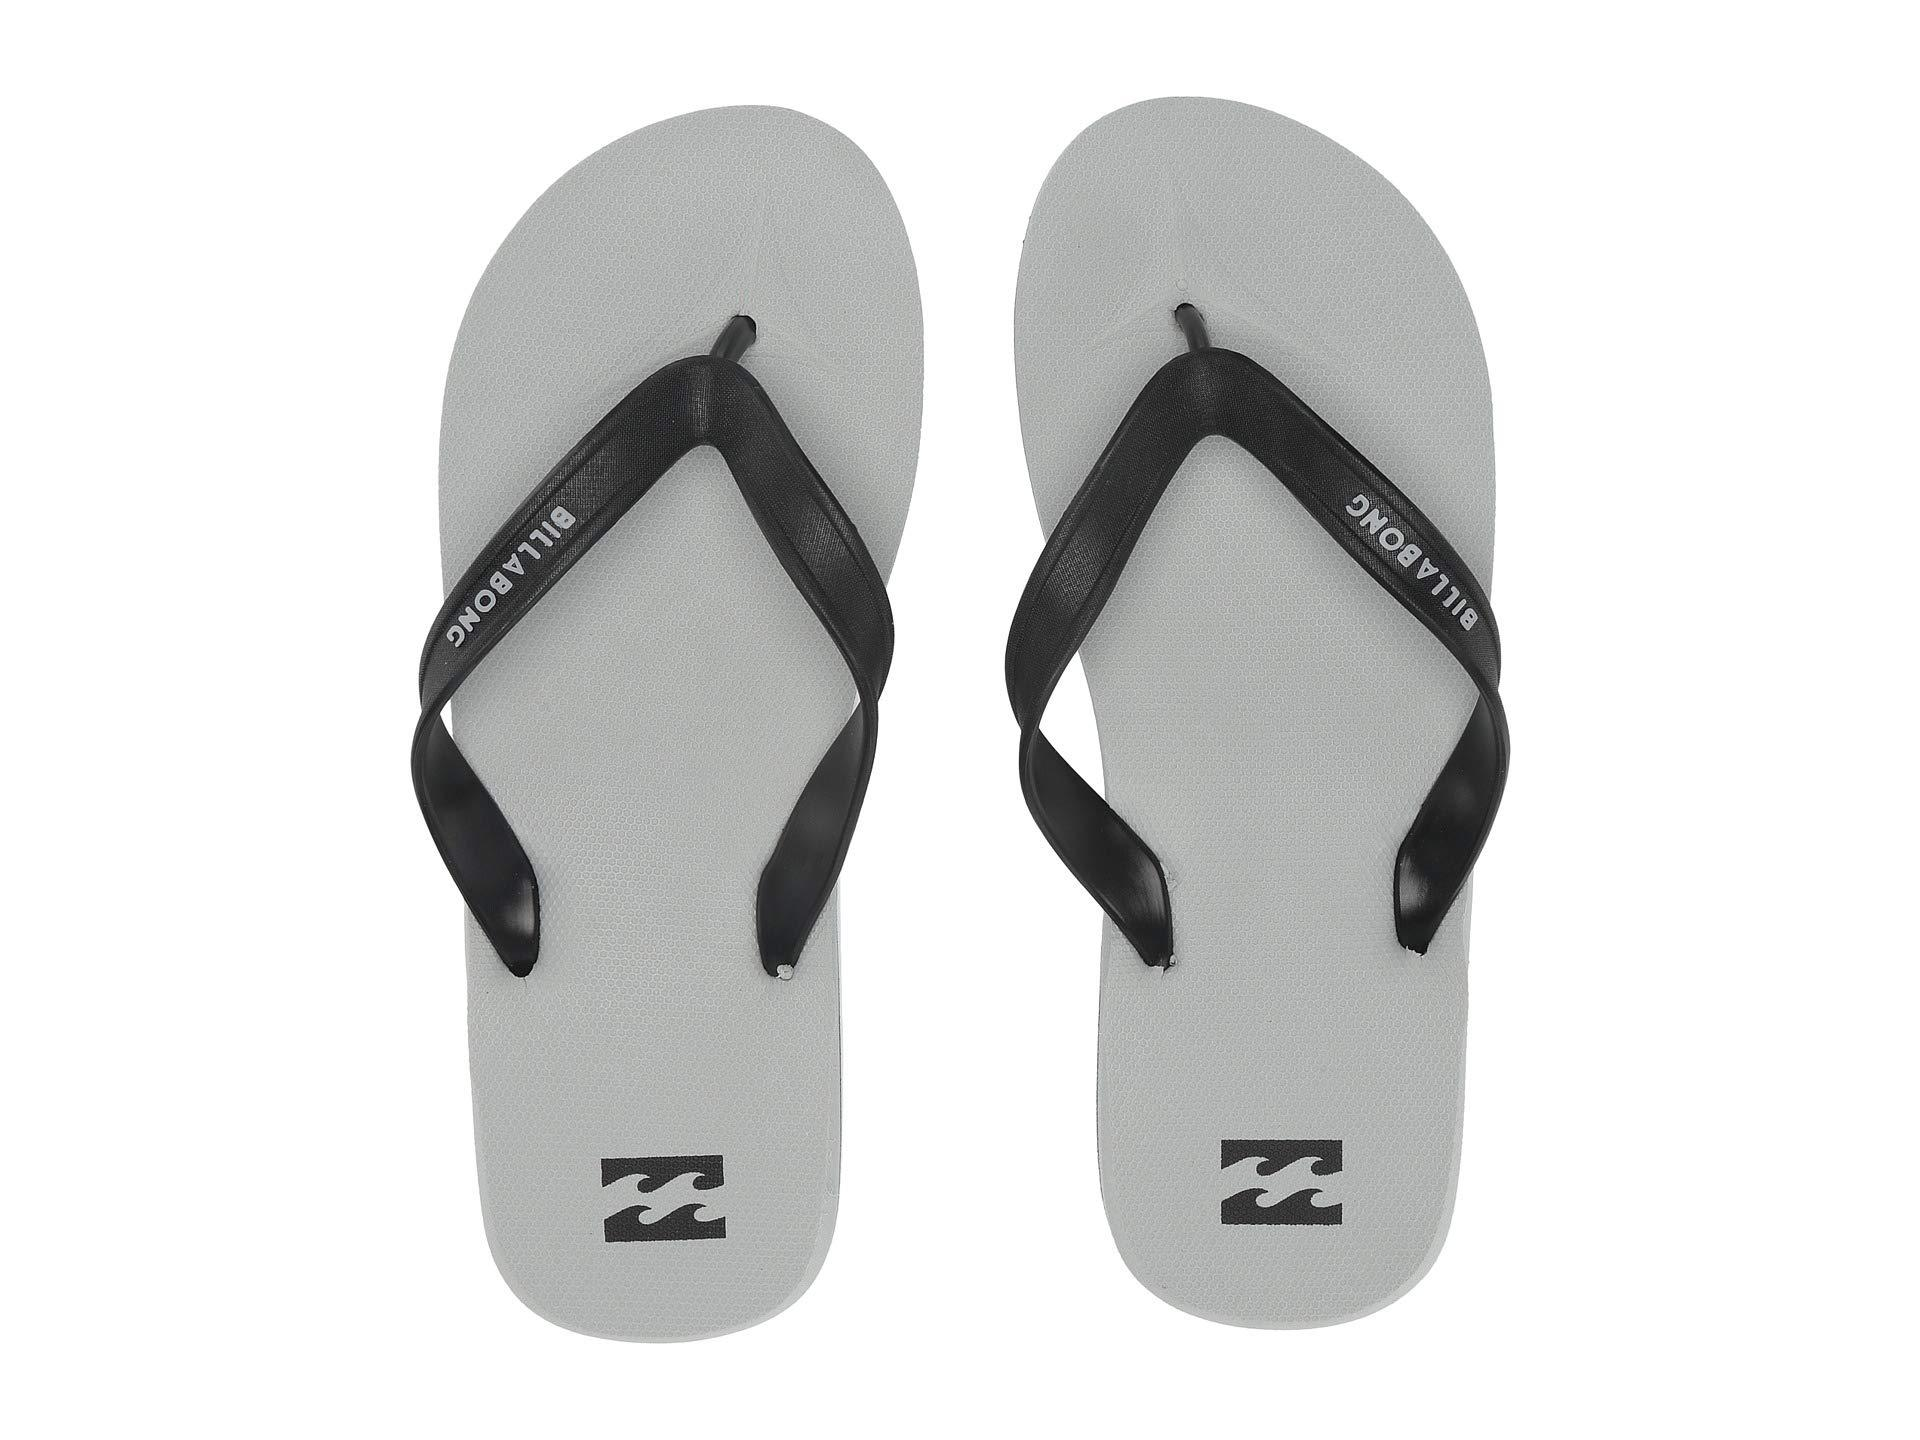 d5931ecf8 Billabong - Gray All Day Solid Sandal (bright Blue) Men s Sandals for Men  -. View fullscreen